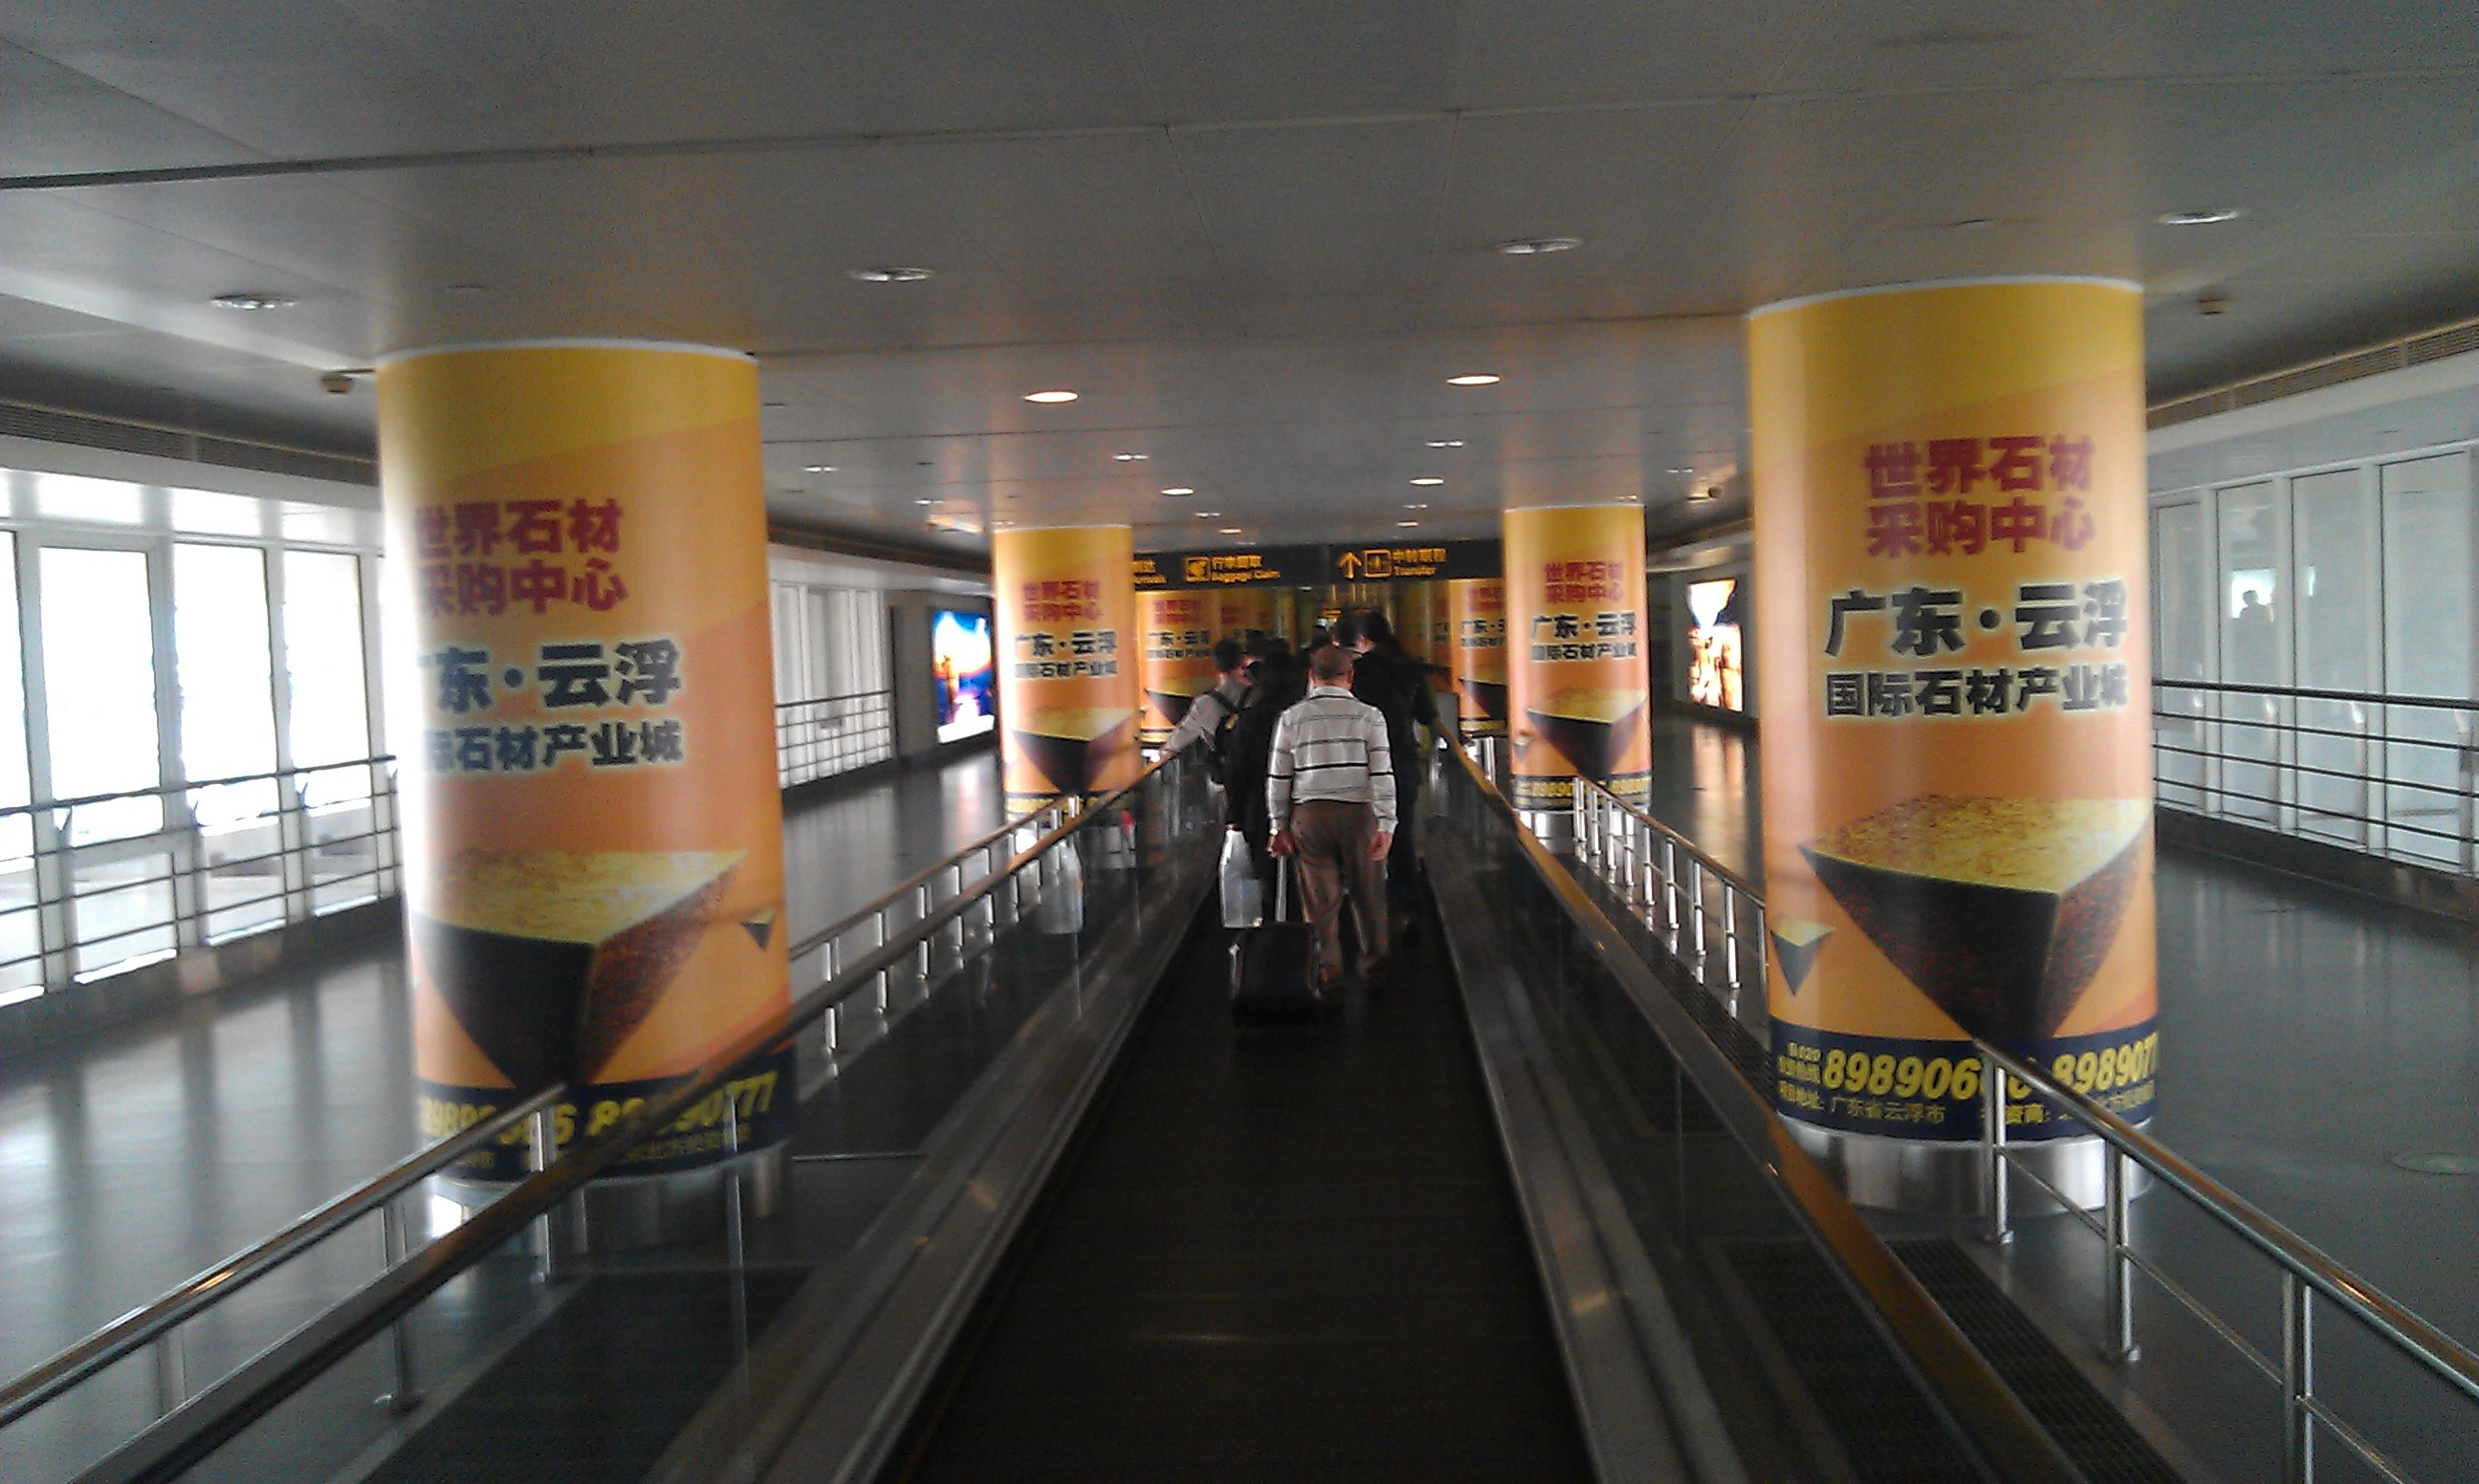 Cr nica de un viaje guangzhou primera impresi n que Primera impresion